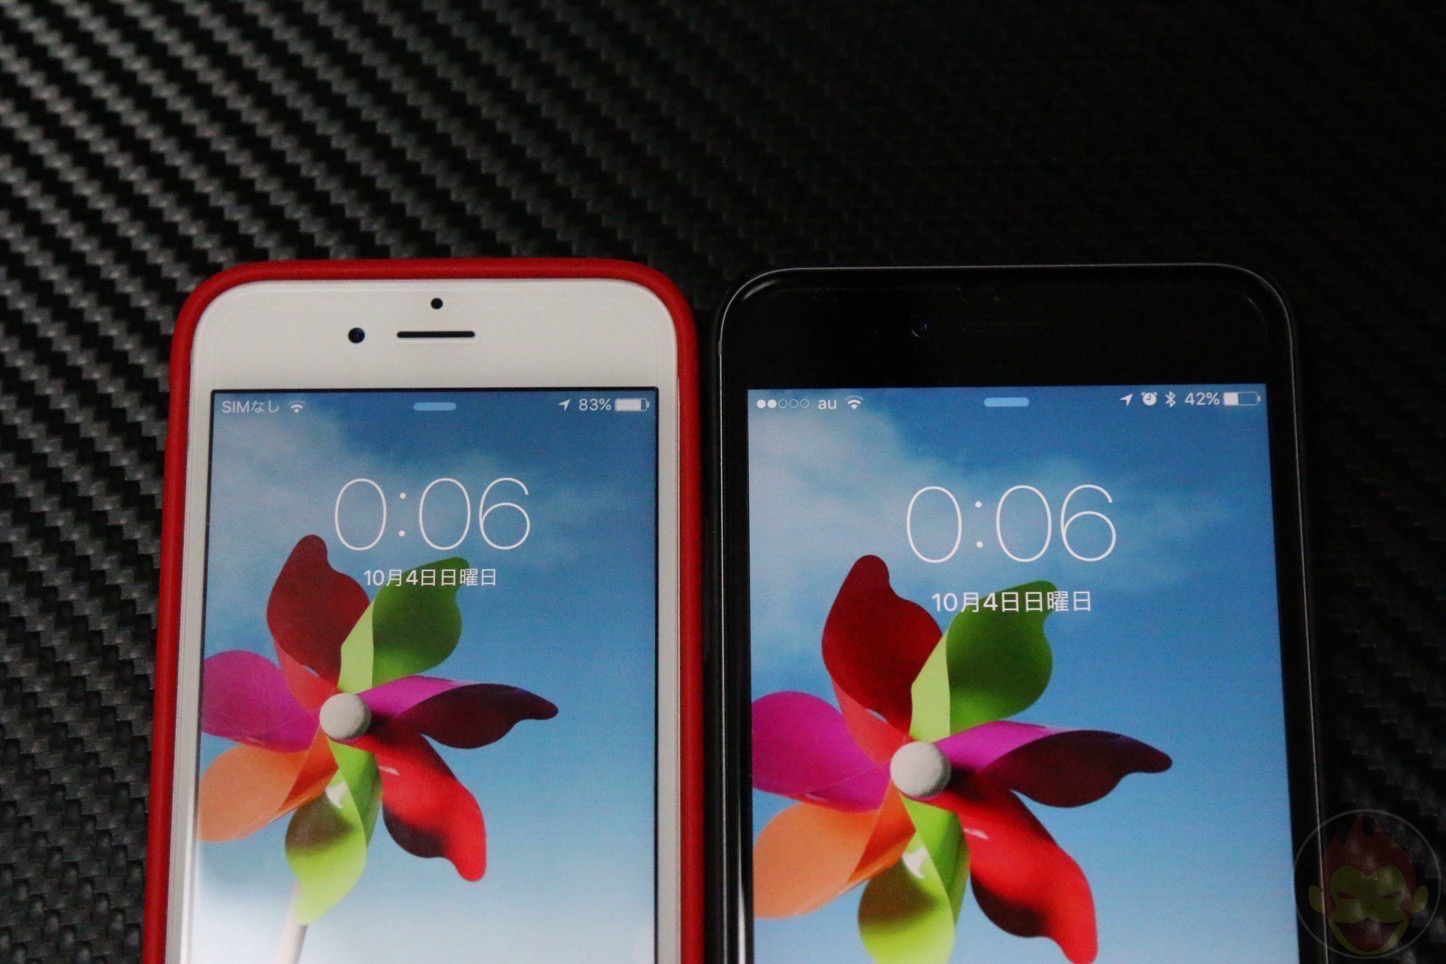 iPhone6s-6splus-battery-life-12.JPG